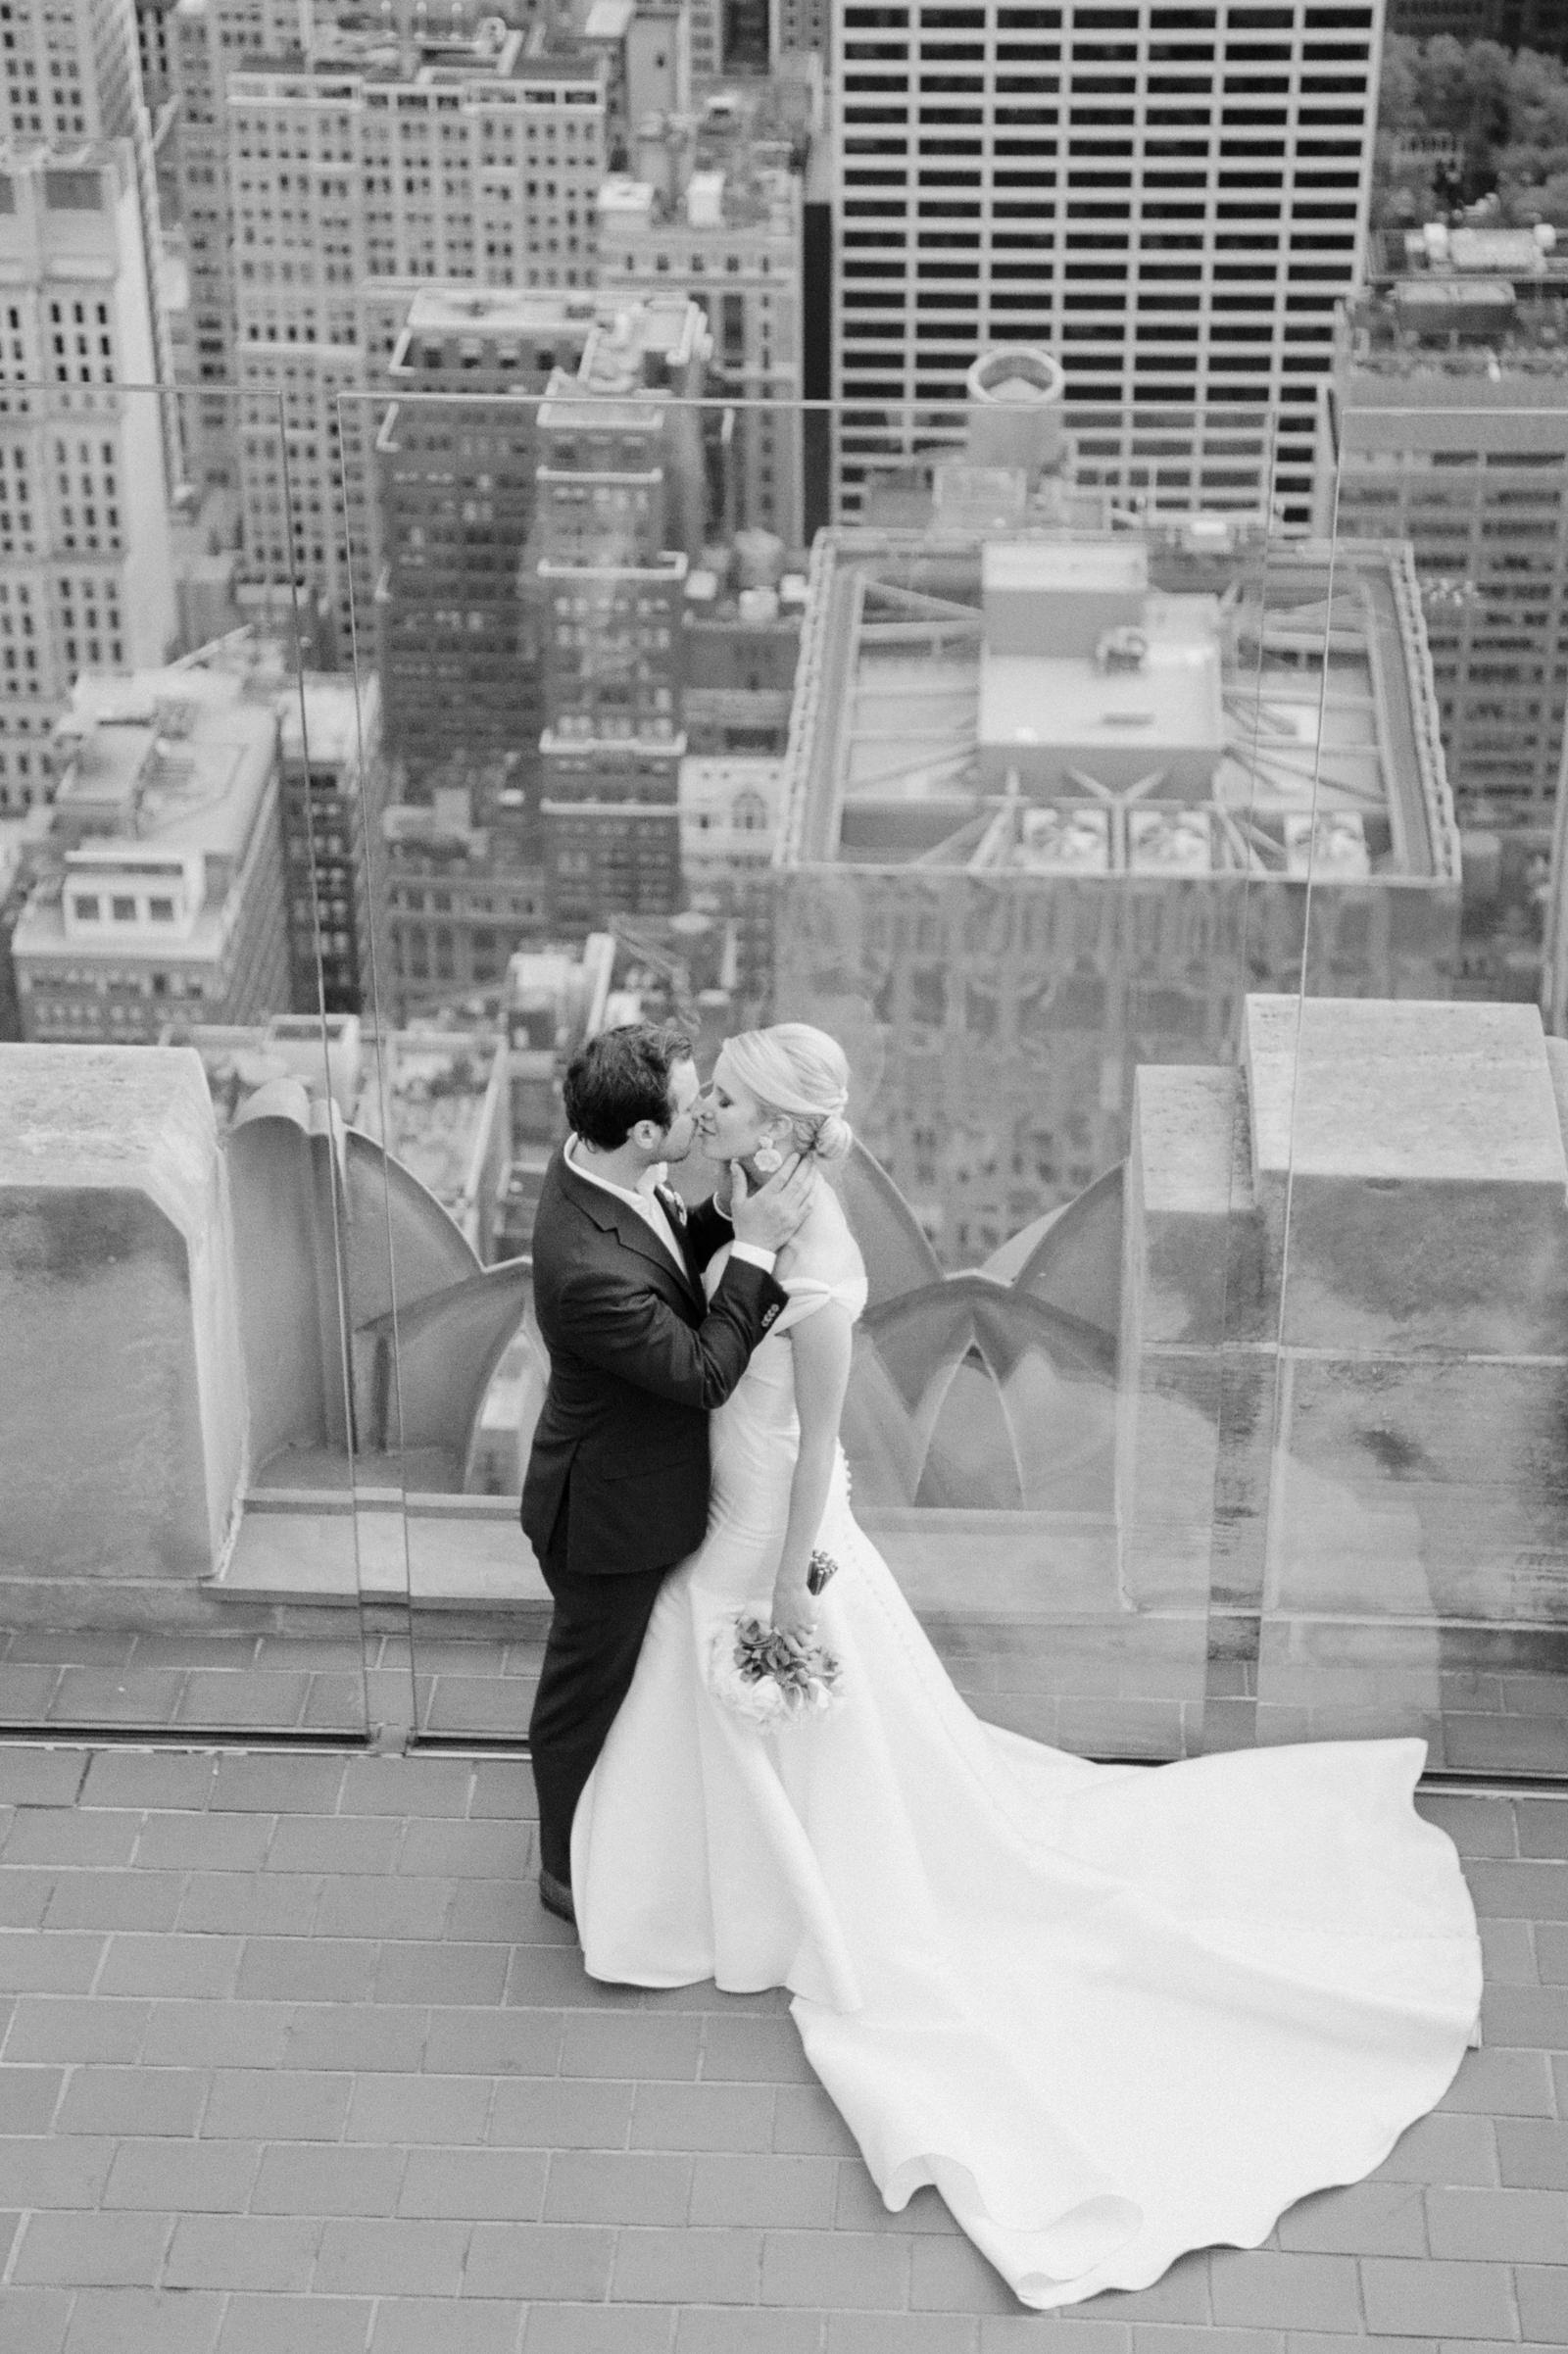 Intimate-NYC_wedding_ by Tanya Isaeva-170.jpg